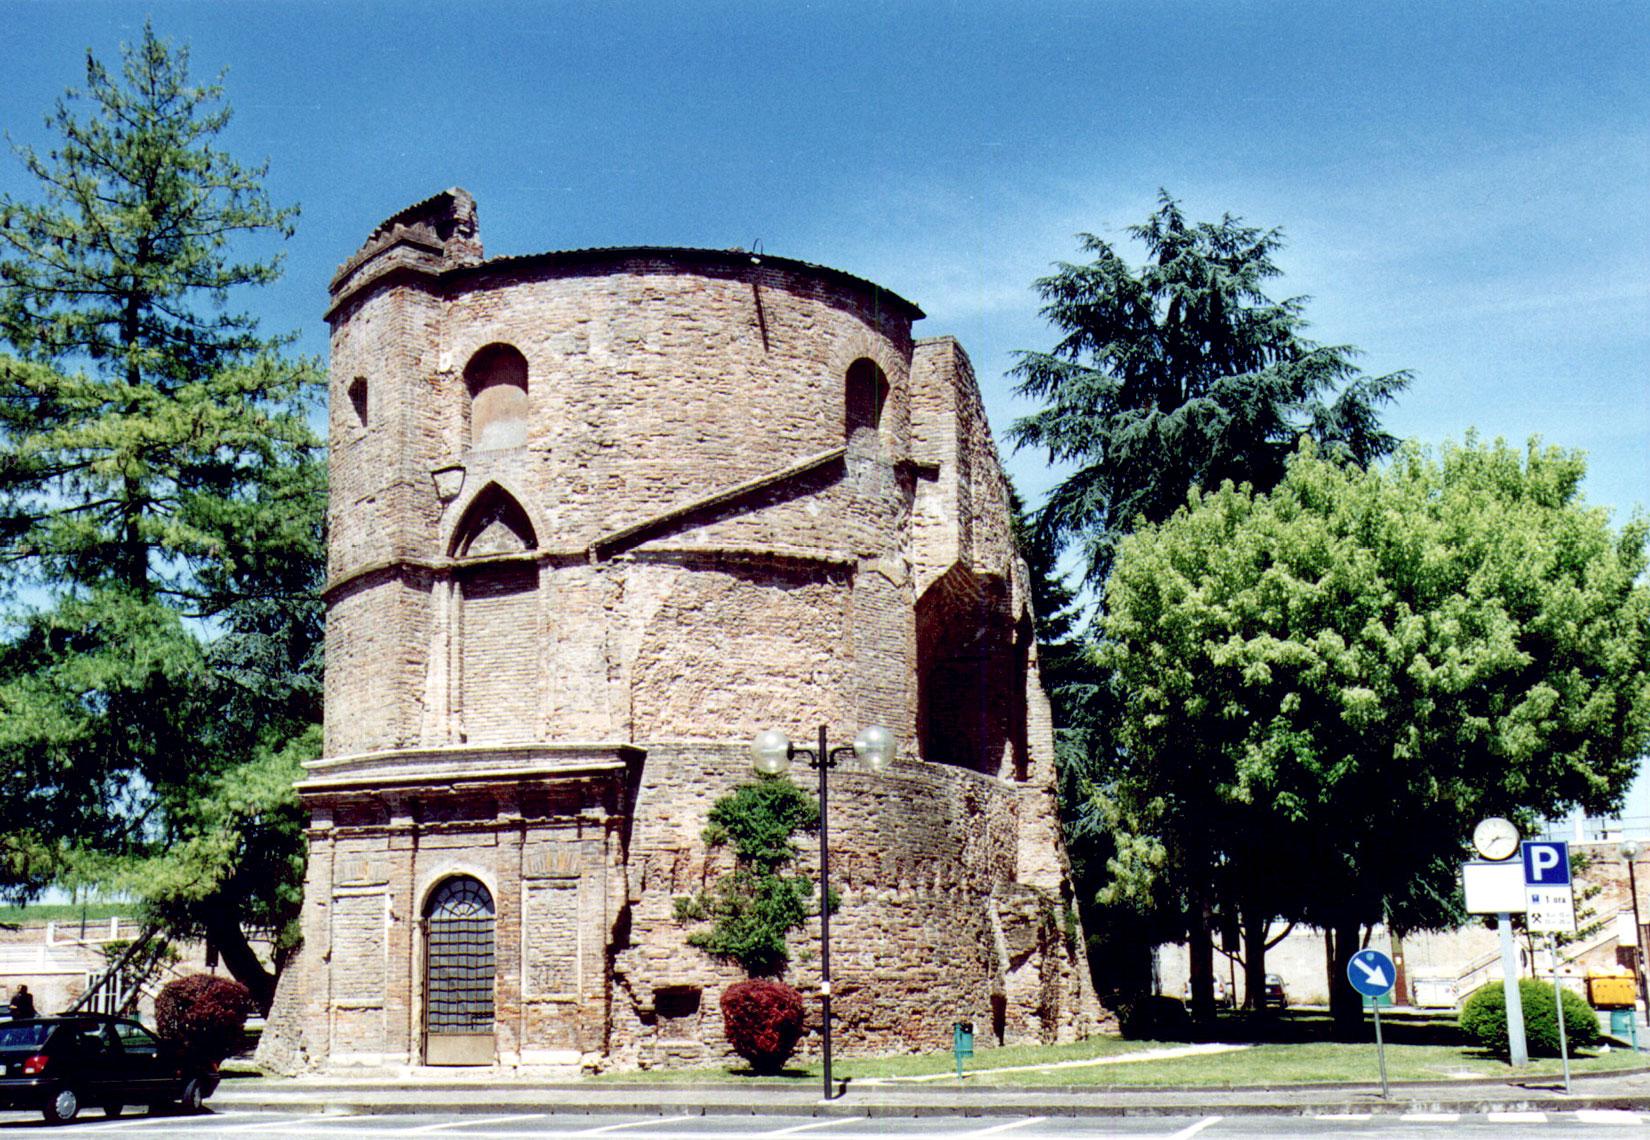 Legnago (Vr), Piazza della Libertà, Torrione